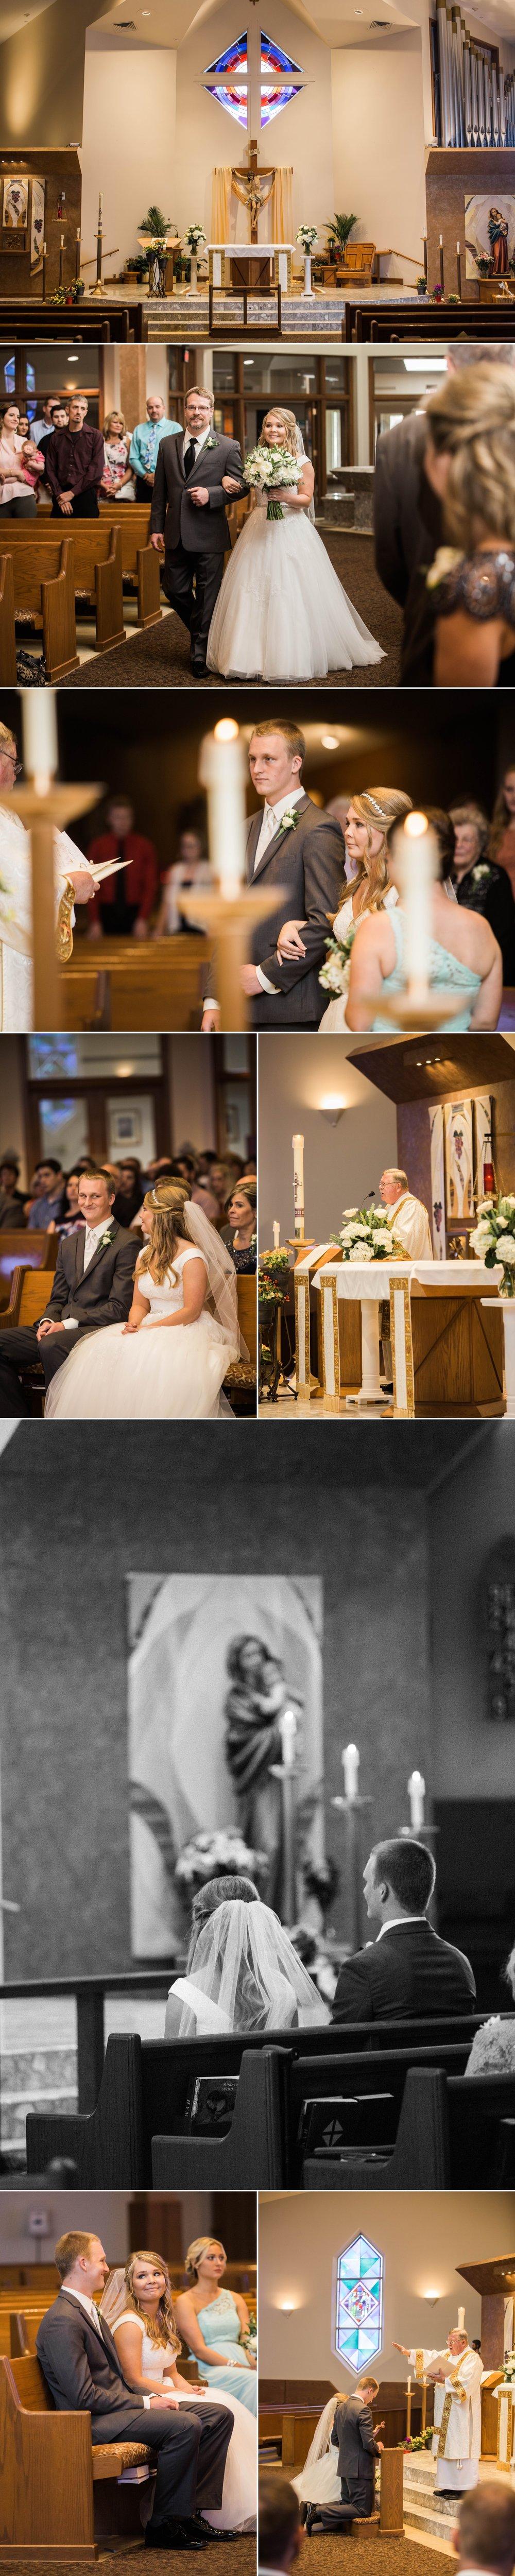 fort wayne - ceremony - wedding - church - bride - groom